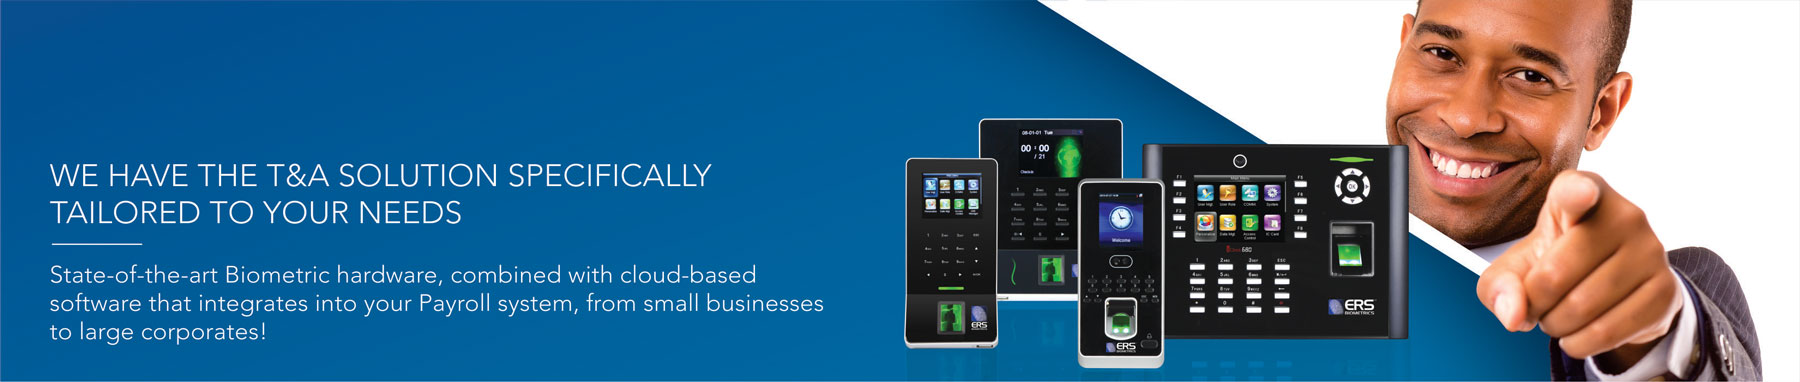 ERSBio T&A hardware